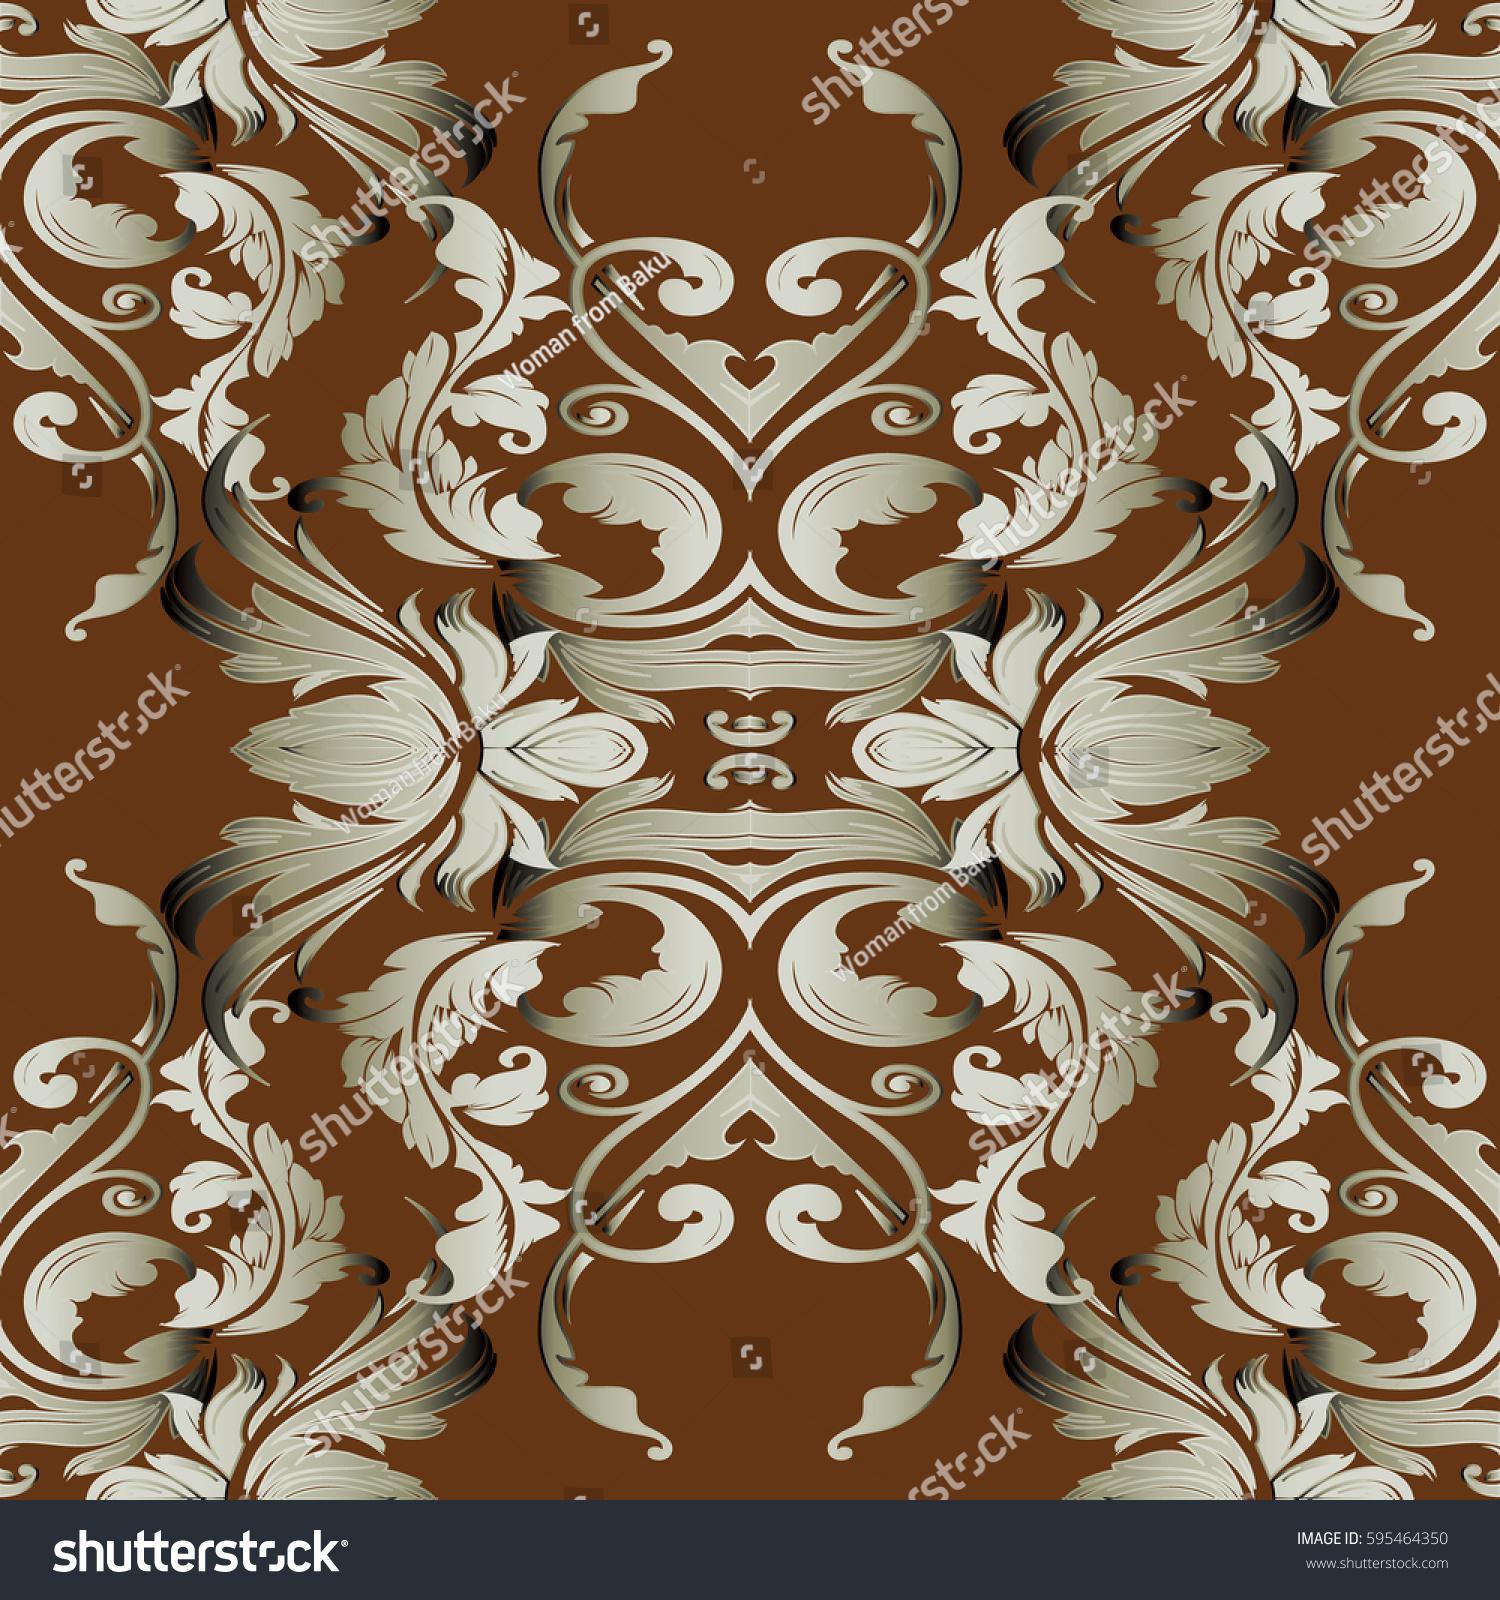 Baroque Floral Seamless Pattern Elegant Brown Background Wallpaper Illustration With 3d Beige Damask Ornaments In